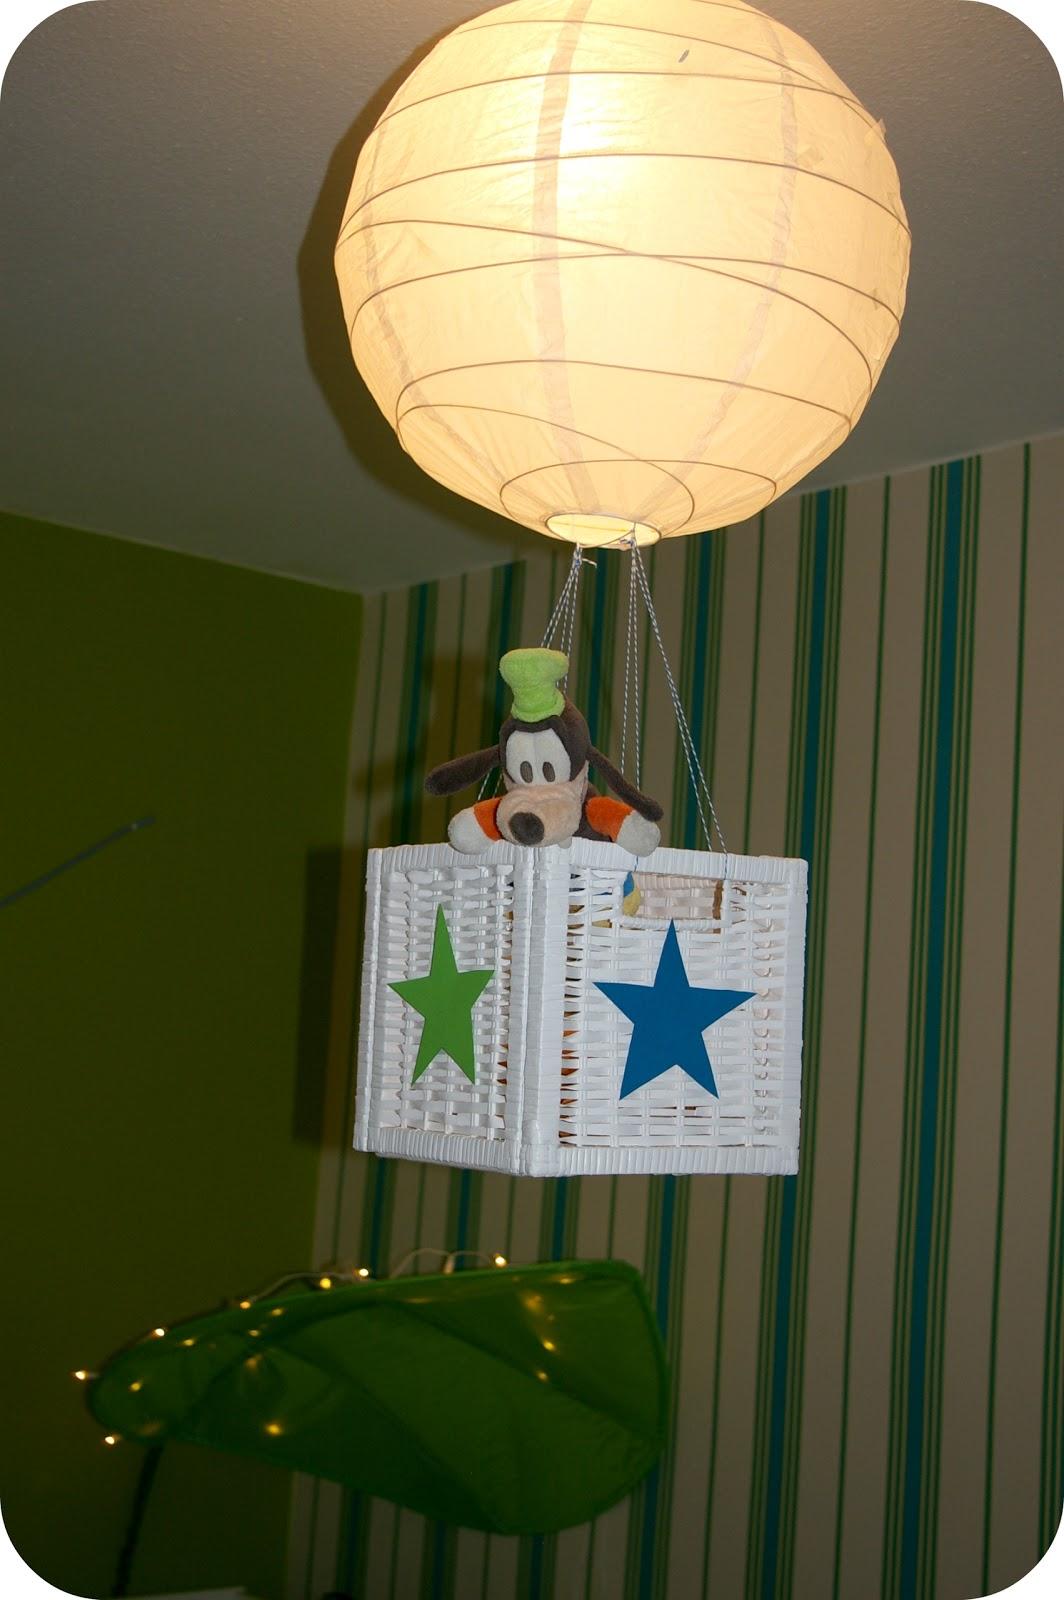 jerrys welt diy hei luftballon lampe. Black Bedroom Furniture Sets. Home Design Ideas